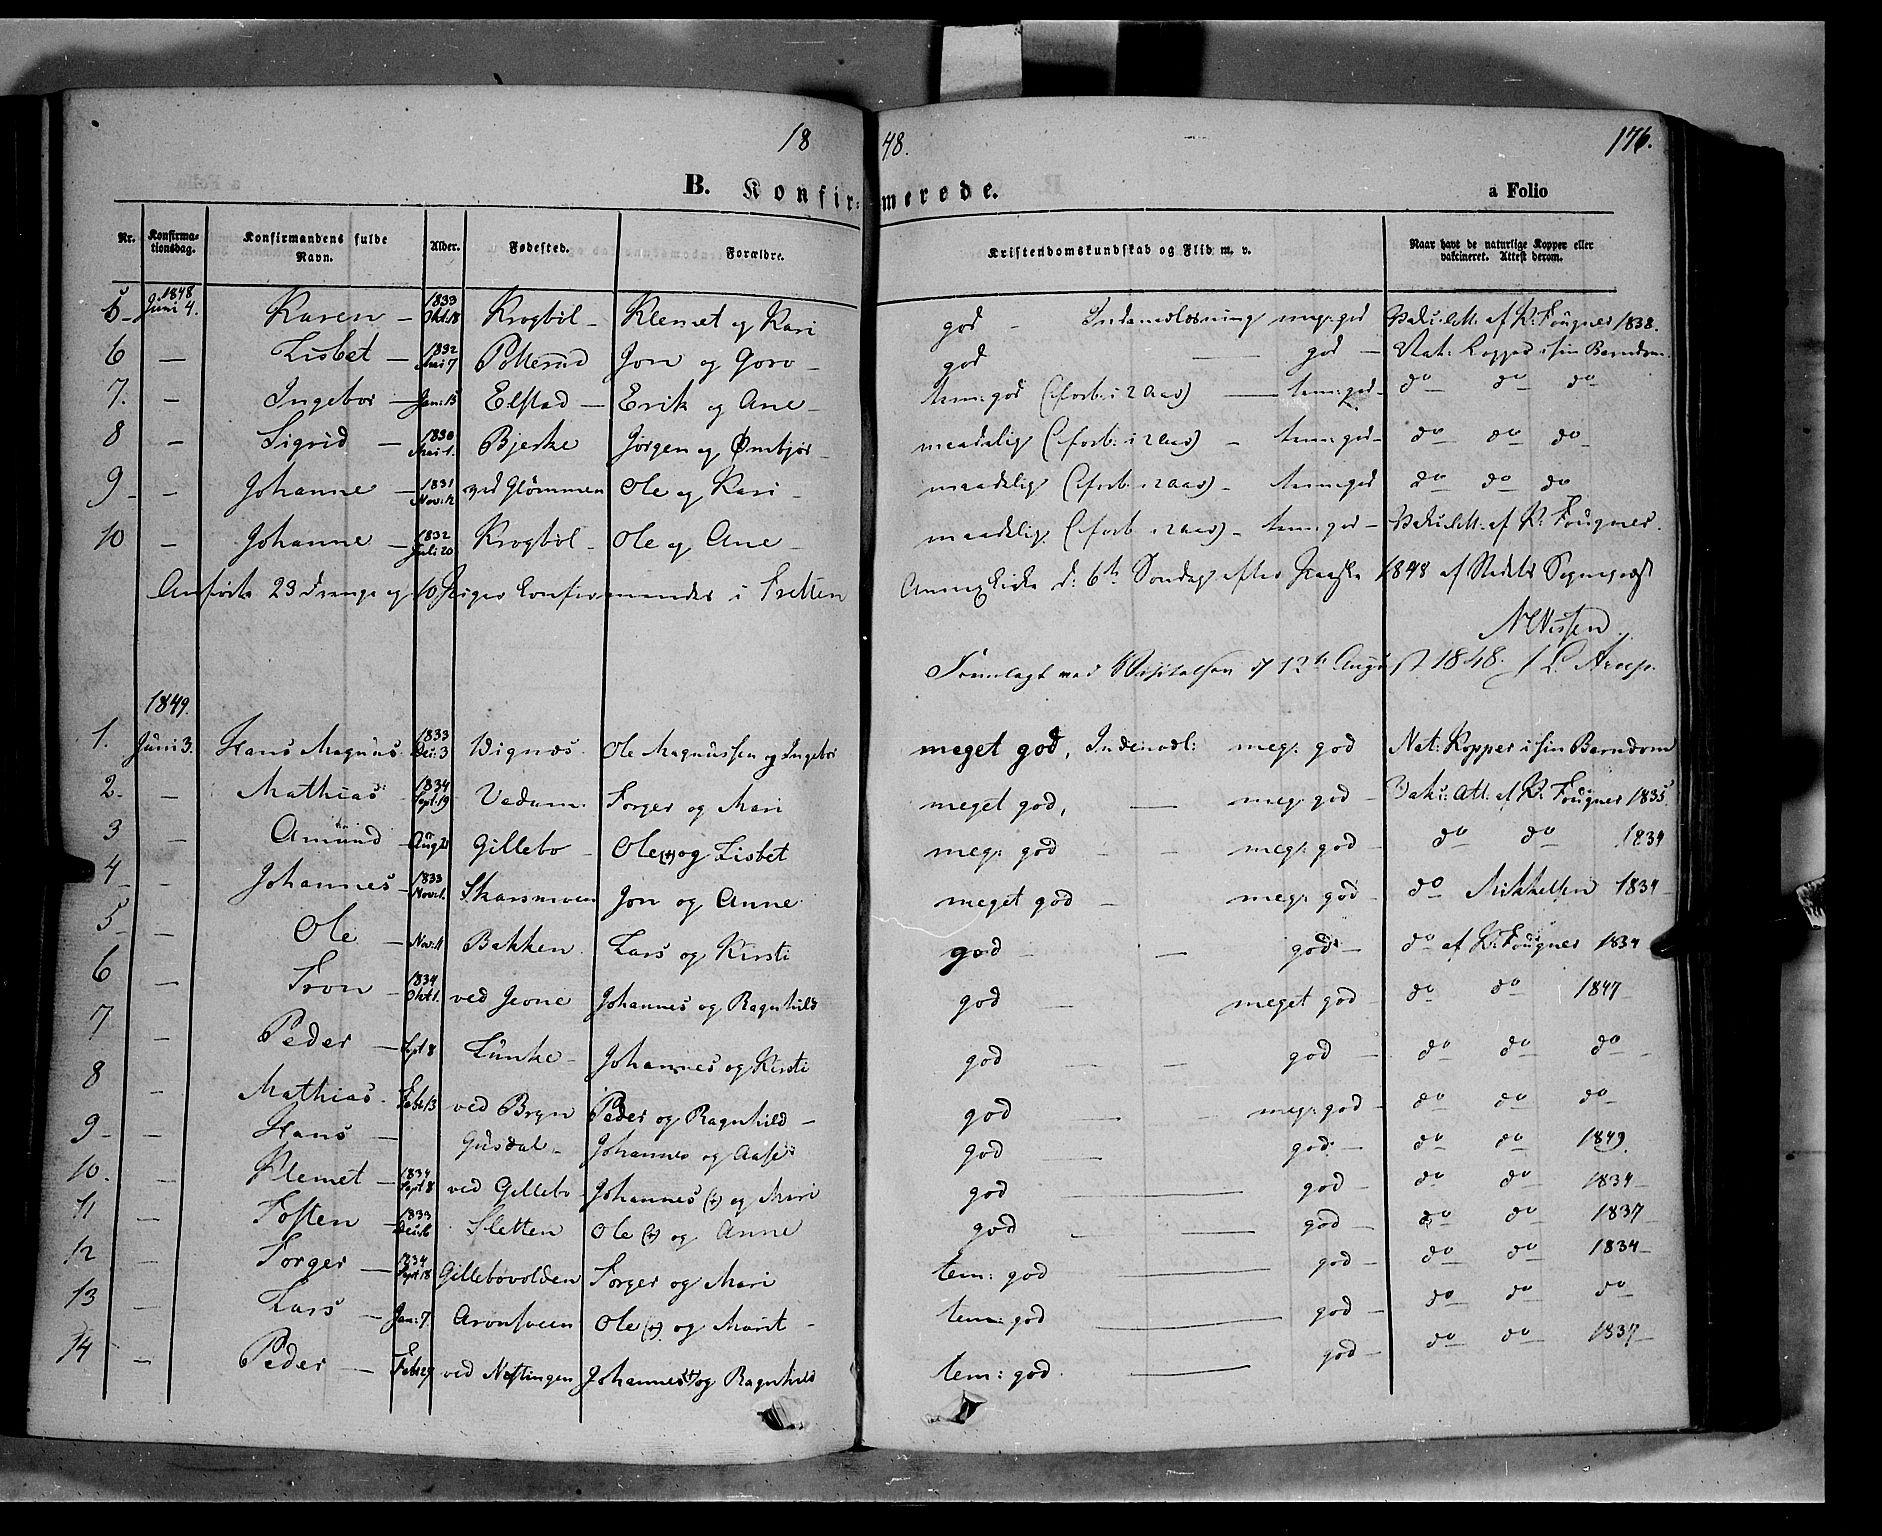 SAH, Øyer prestekontor, Ministerialbok nr. 5, 1842-1857, s. 176